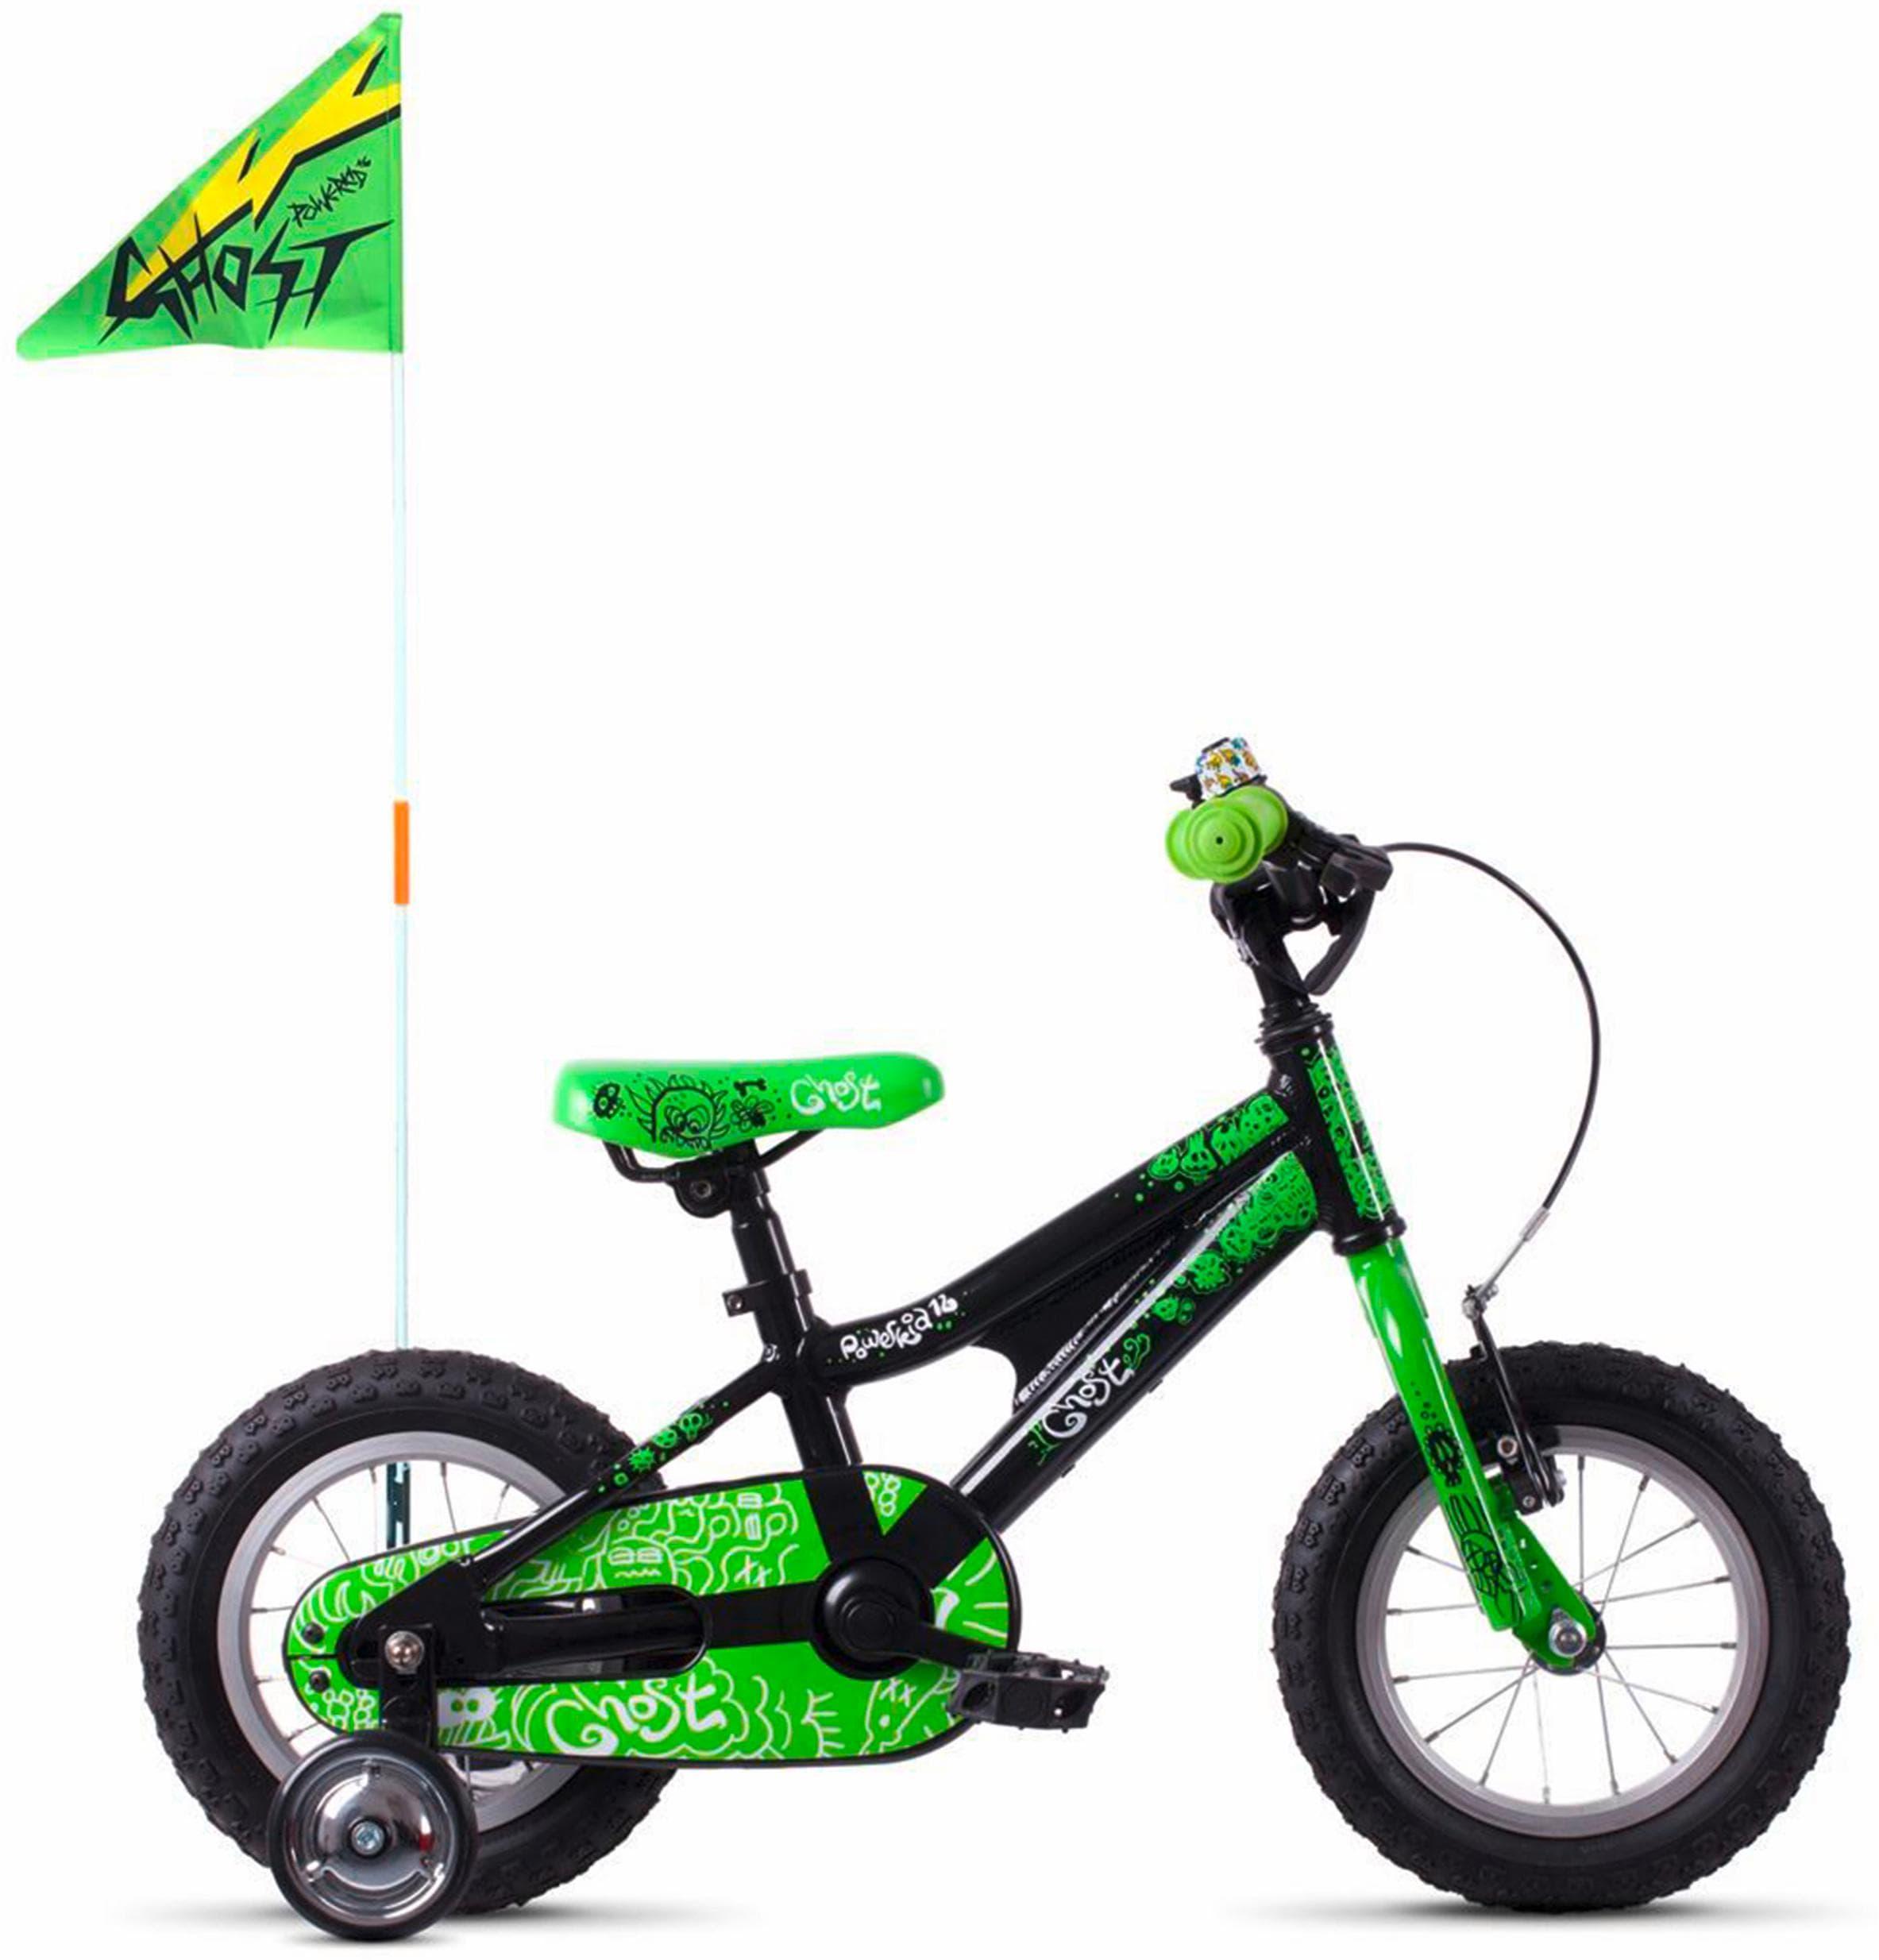 Ghost Kinderfahrrad POWERKID AL 12 K grün Kinder Kinderfahrräder Fahrräder Zubehör Fahrrad